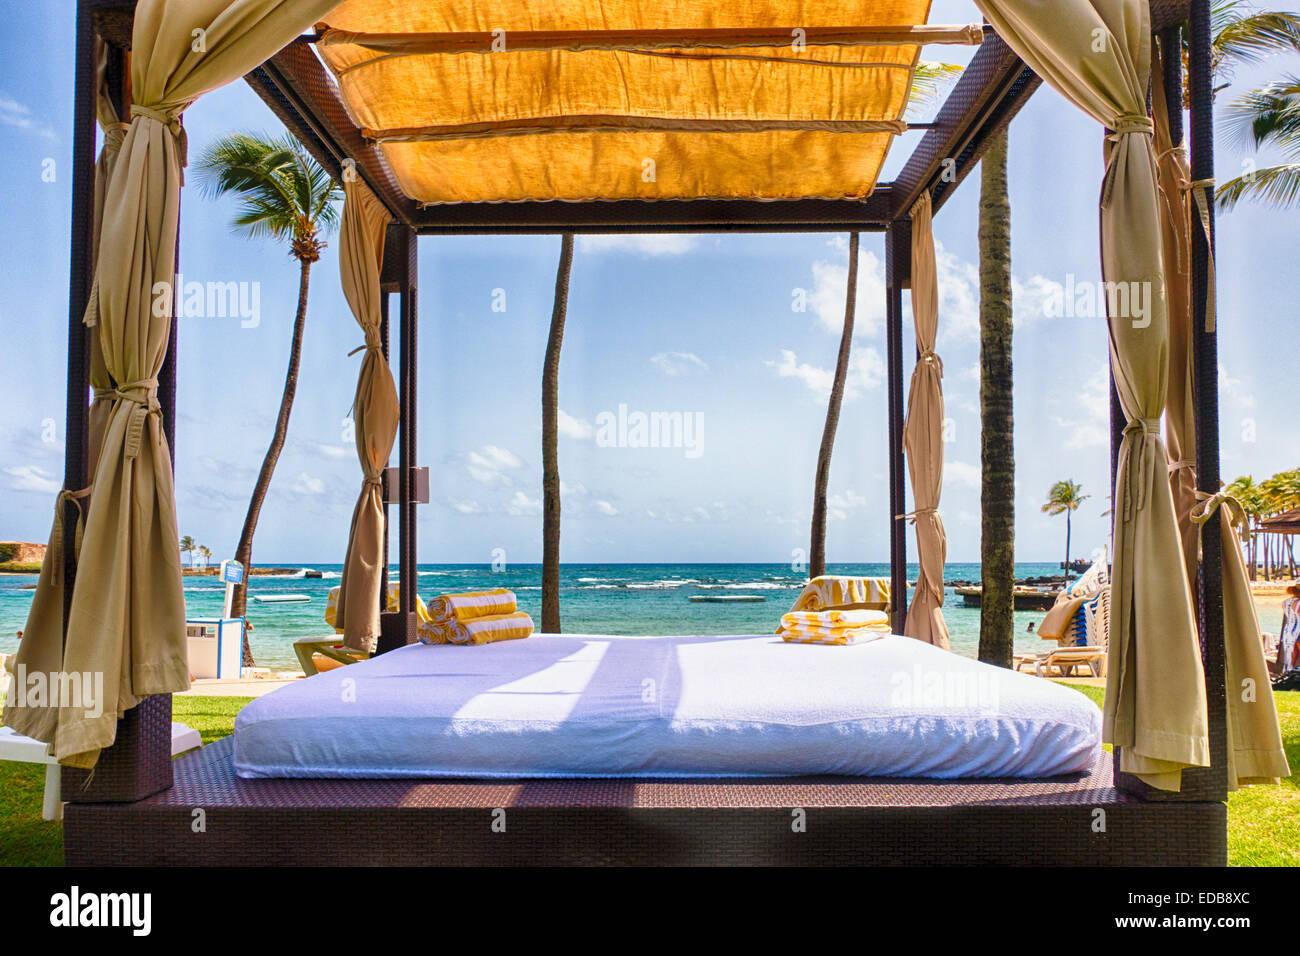 Cabana Zelt auf einer Karibik-Strand, San Juan, Puerto Rico Stockbild